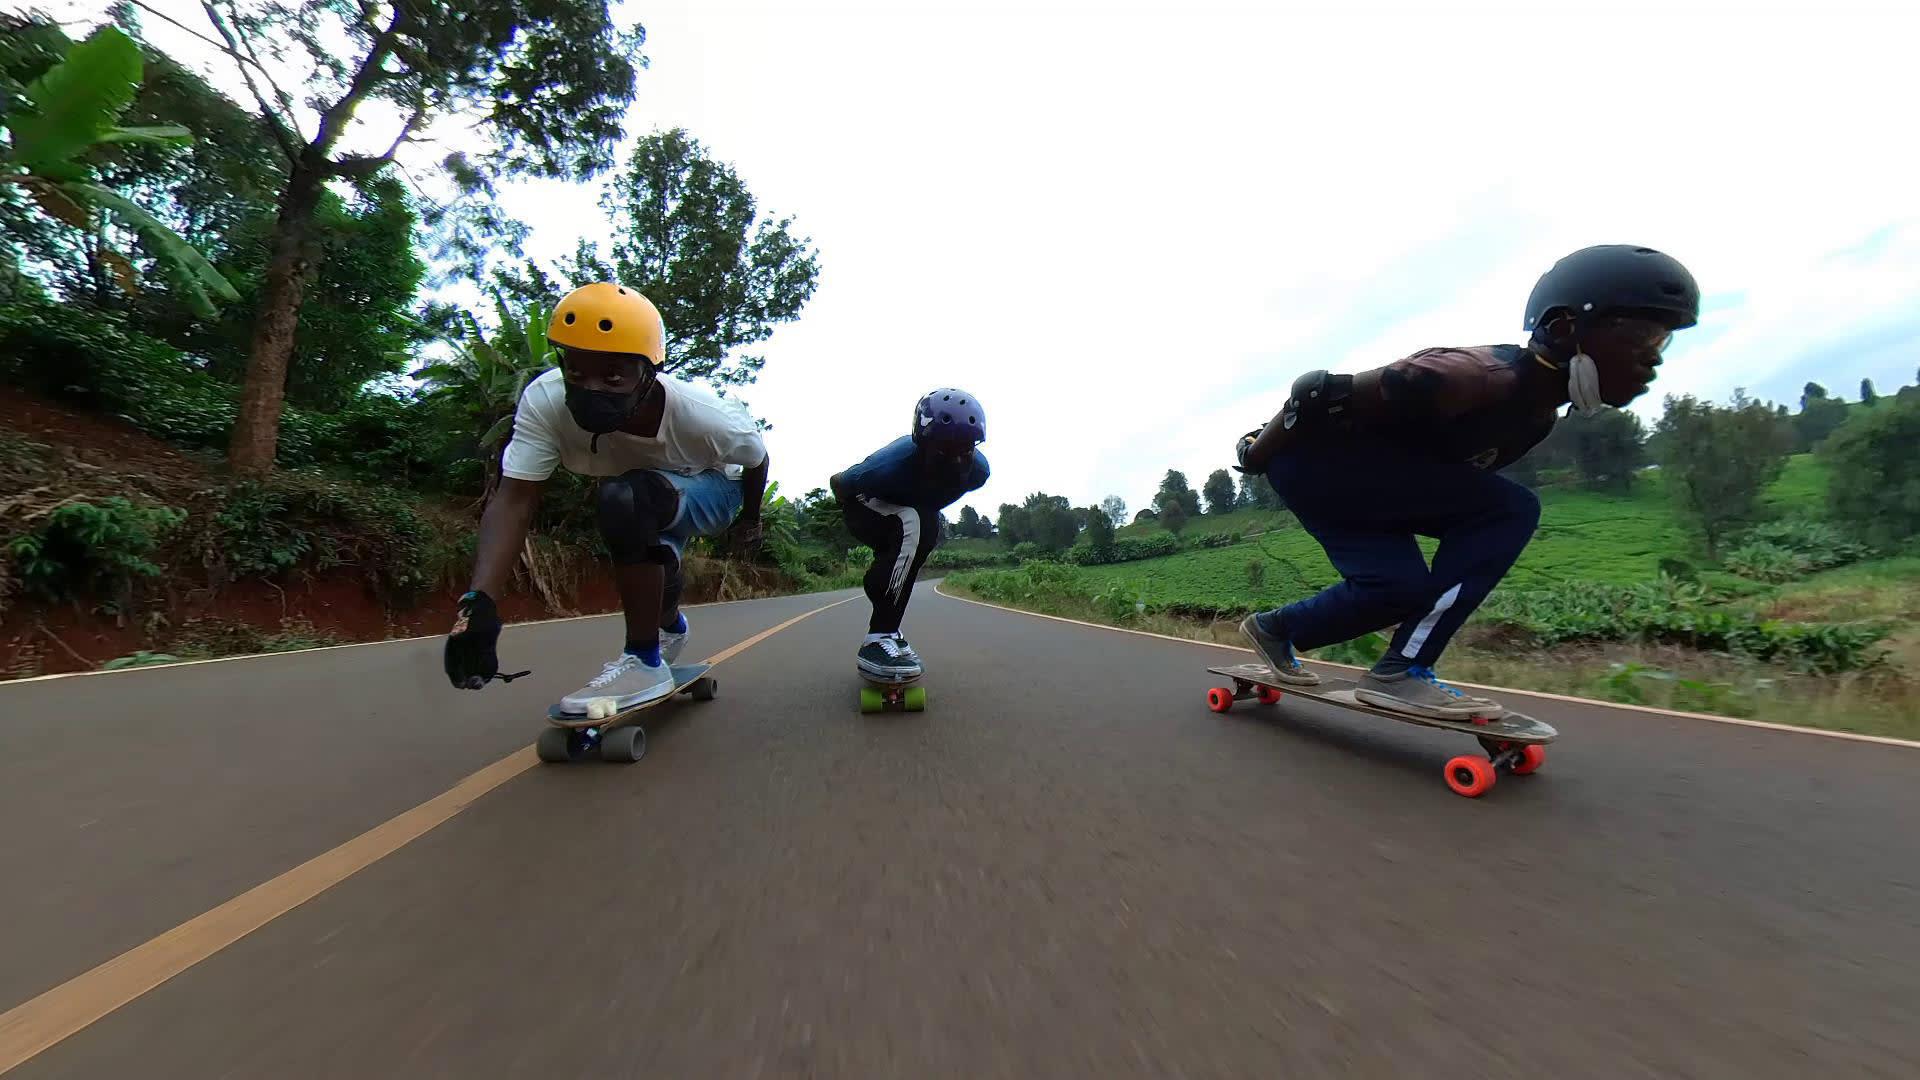 Skateboarder_BodyImage_2